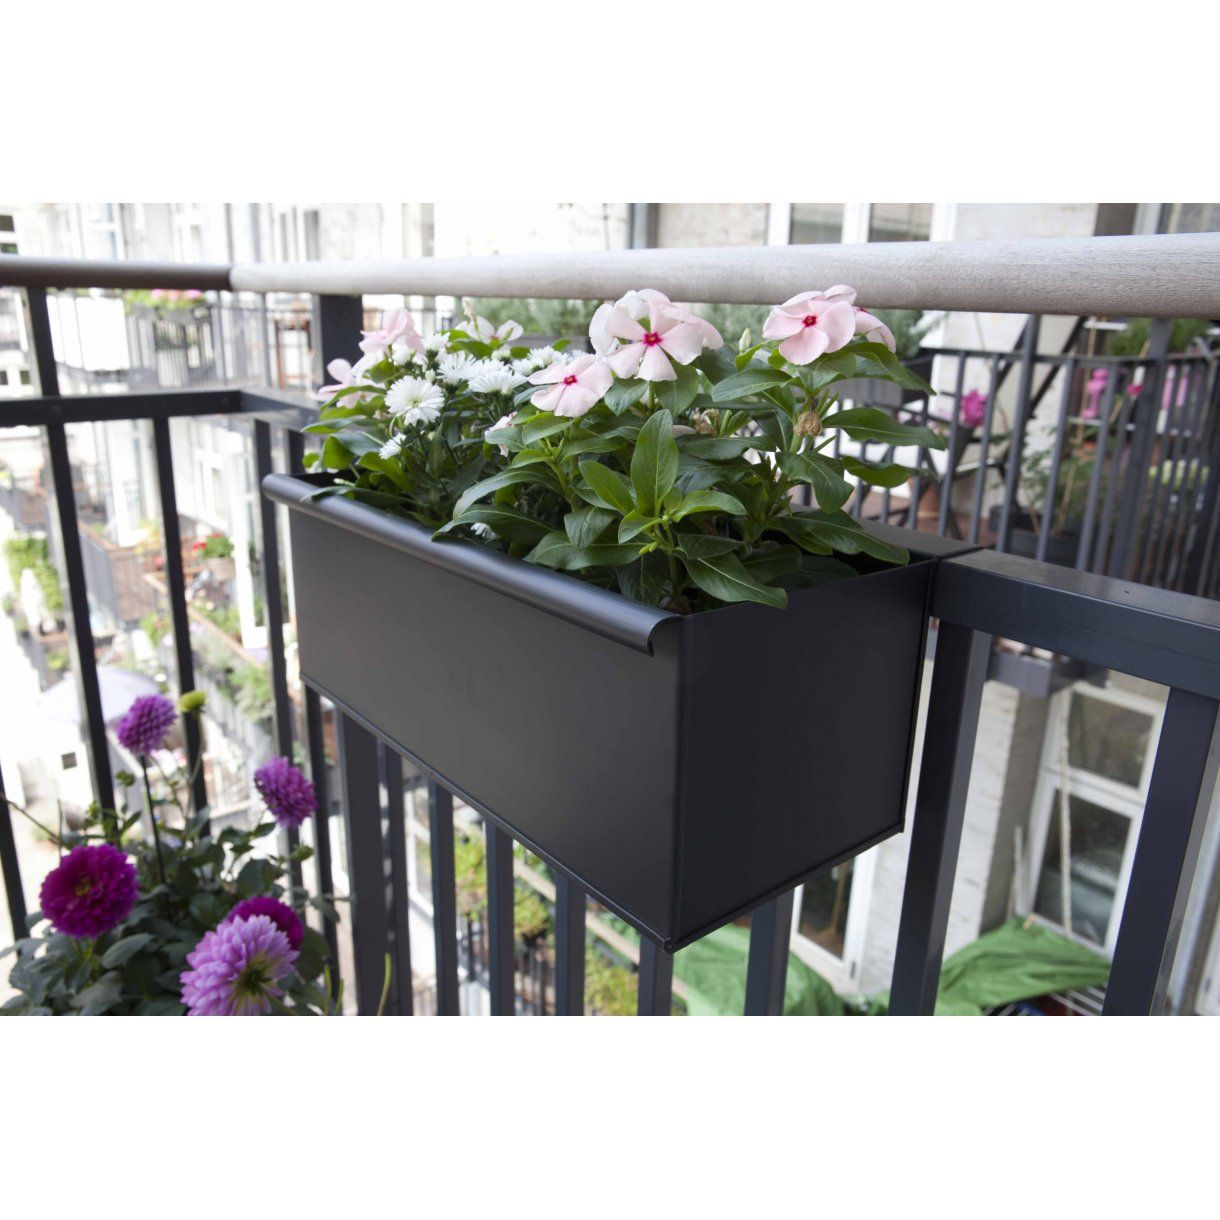 Altanbutikken shop | balconies | pinterest | planter pots, balcony and magazine rack